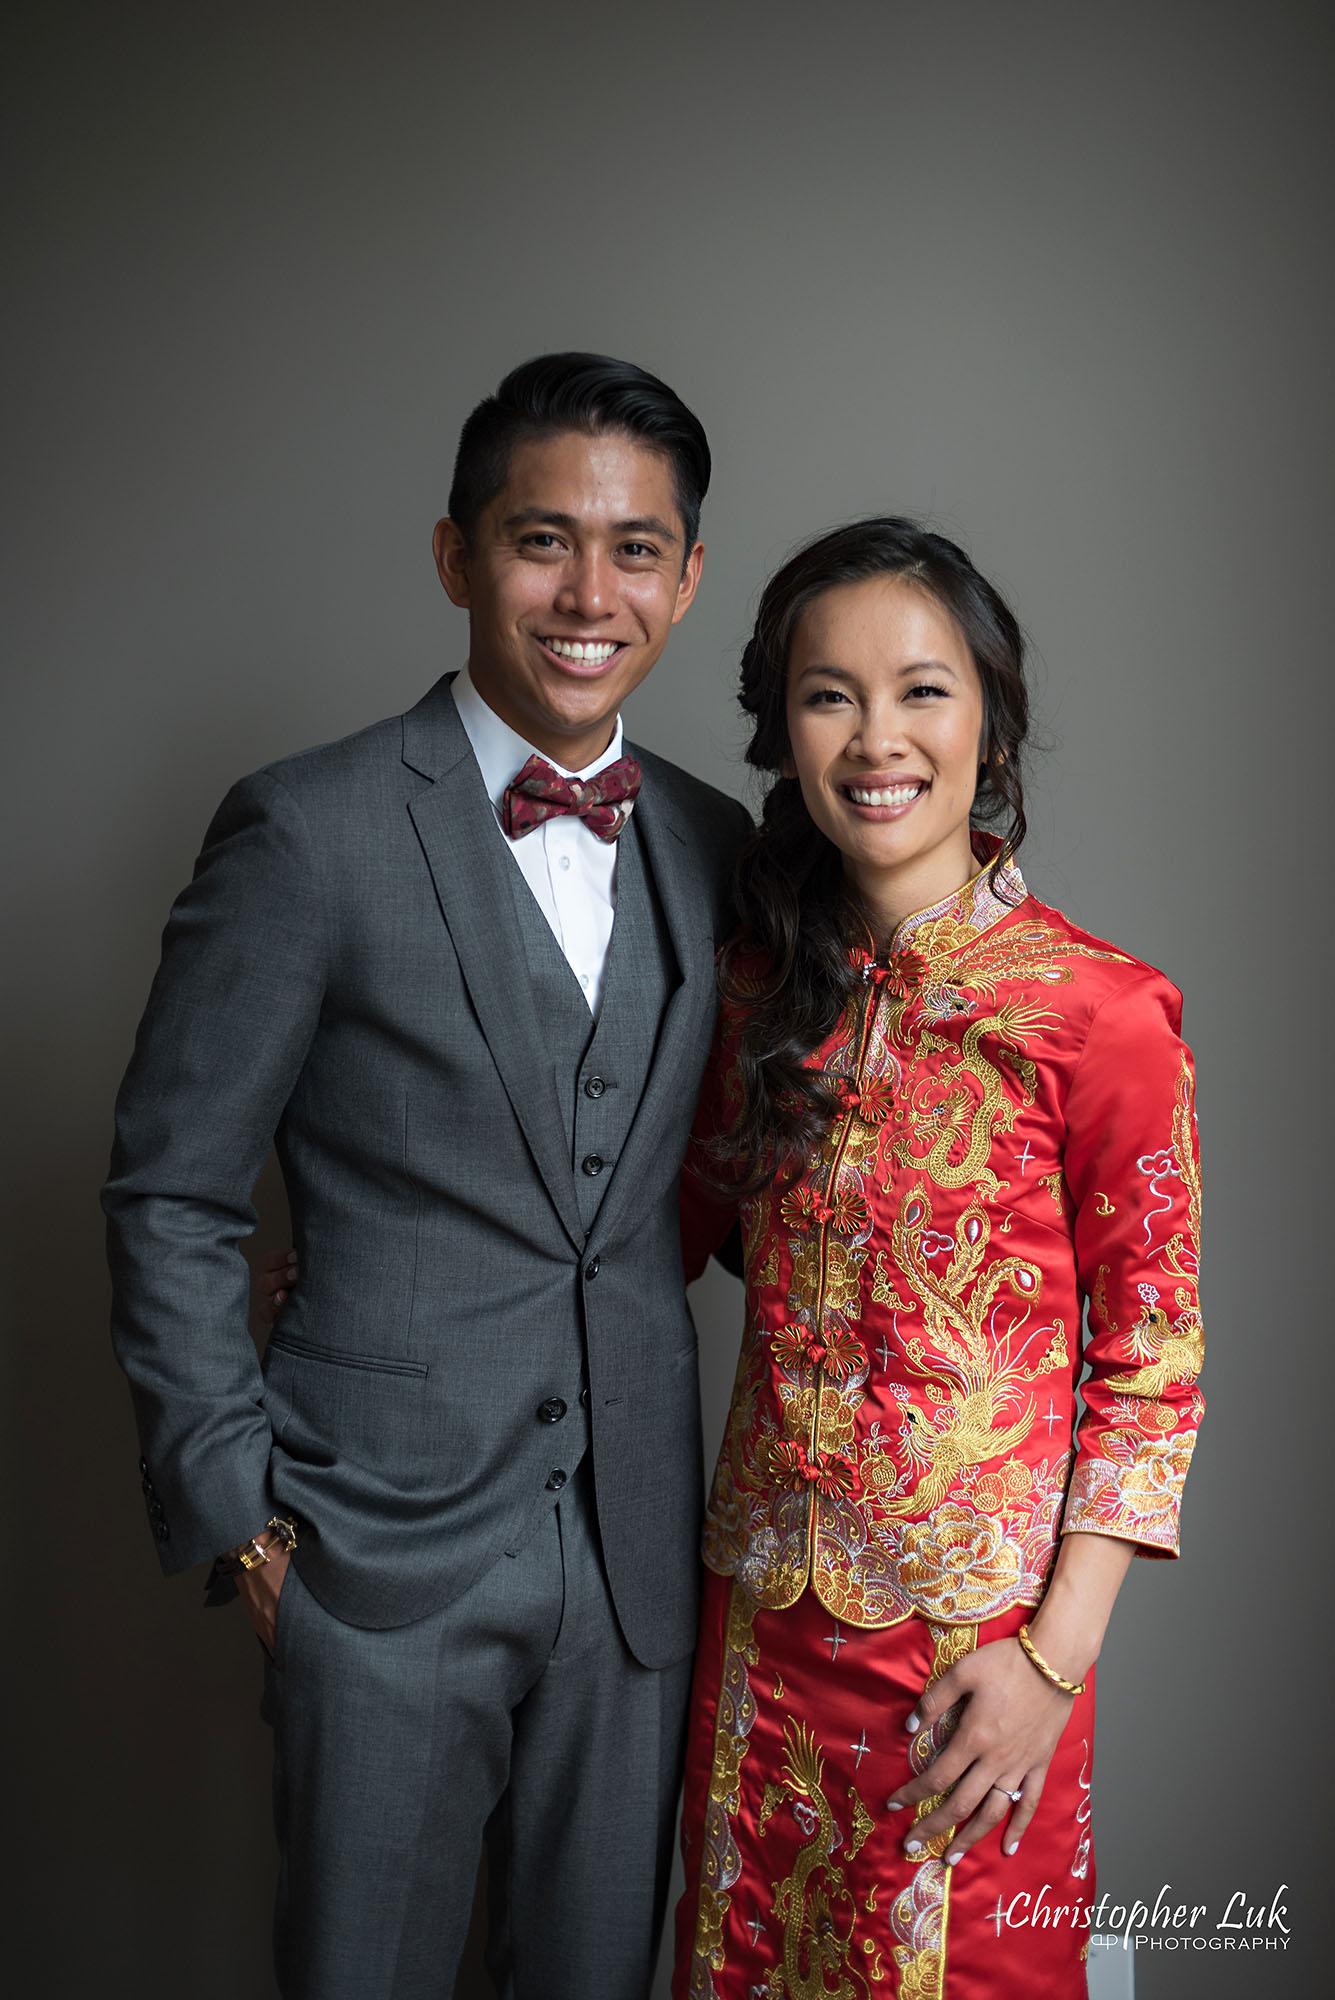 Christopher Luk Photography Toronto Wedding Photographer Chinese Tea Ceremony Bride Groom Candid Natural Photojournalistic Happy Smile Qipao Cheongsam Kua Qua Red Dress